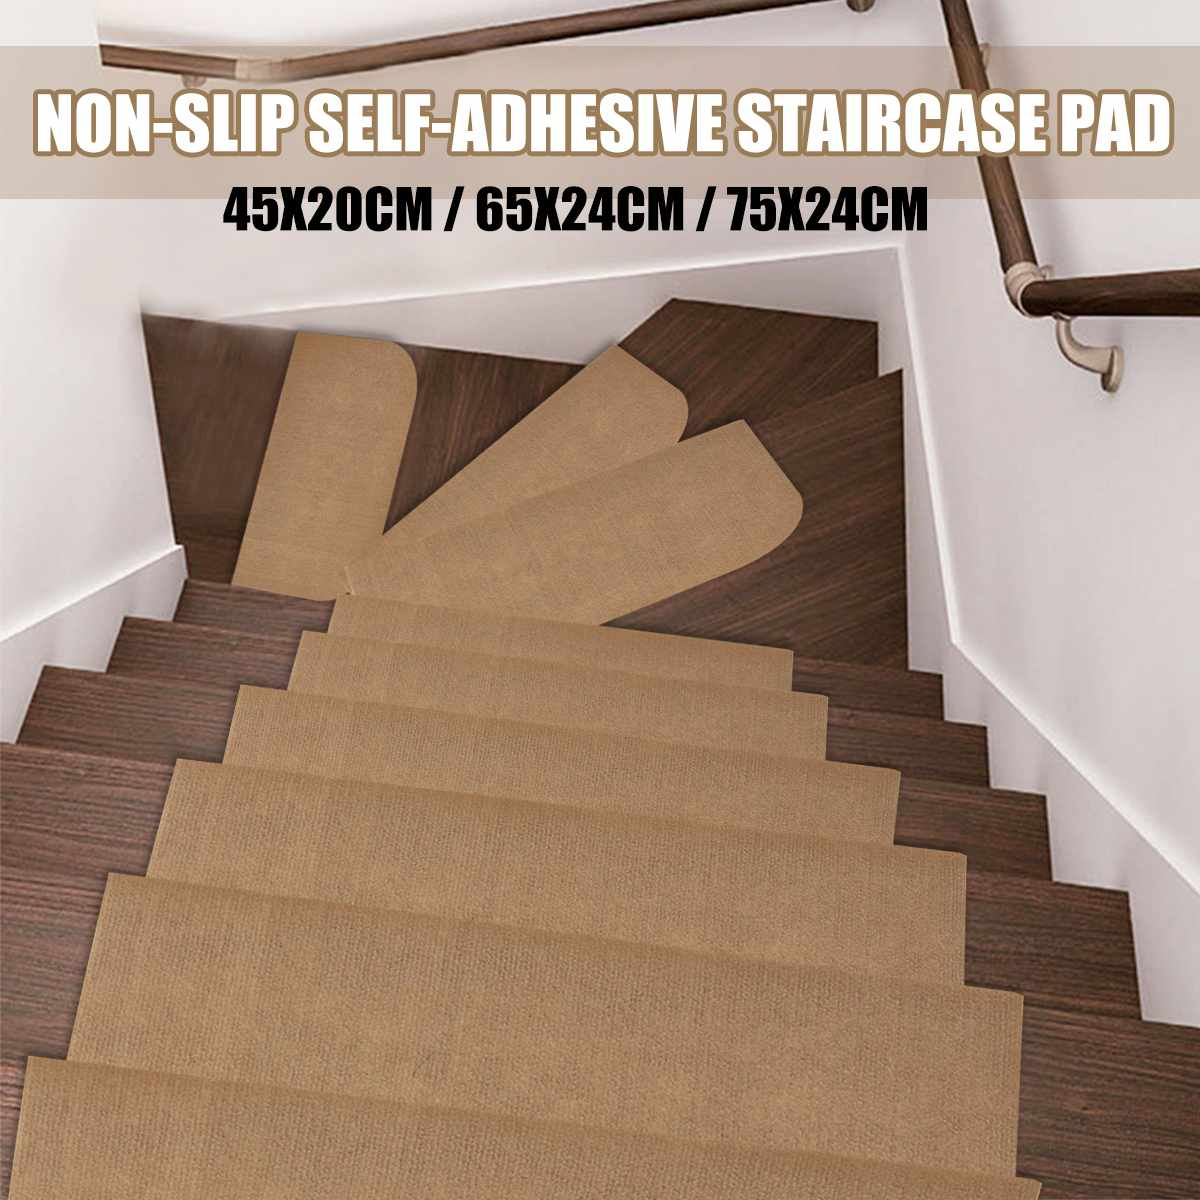 KiWarm 1Pcs Morden Stair Mat Brown Household Carpet Stair Pad Tread Non-Slip Step Rug 45x20cm/65x24cm/75x24cm Home Decoration